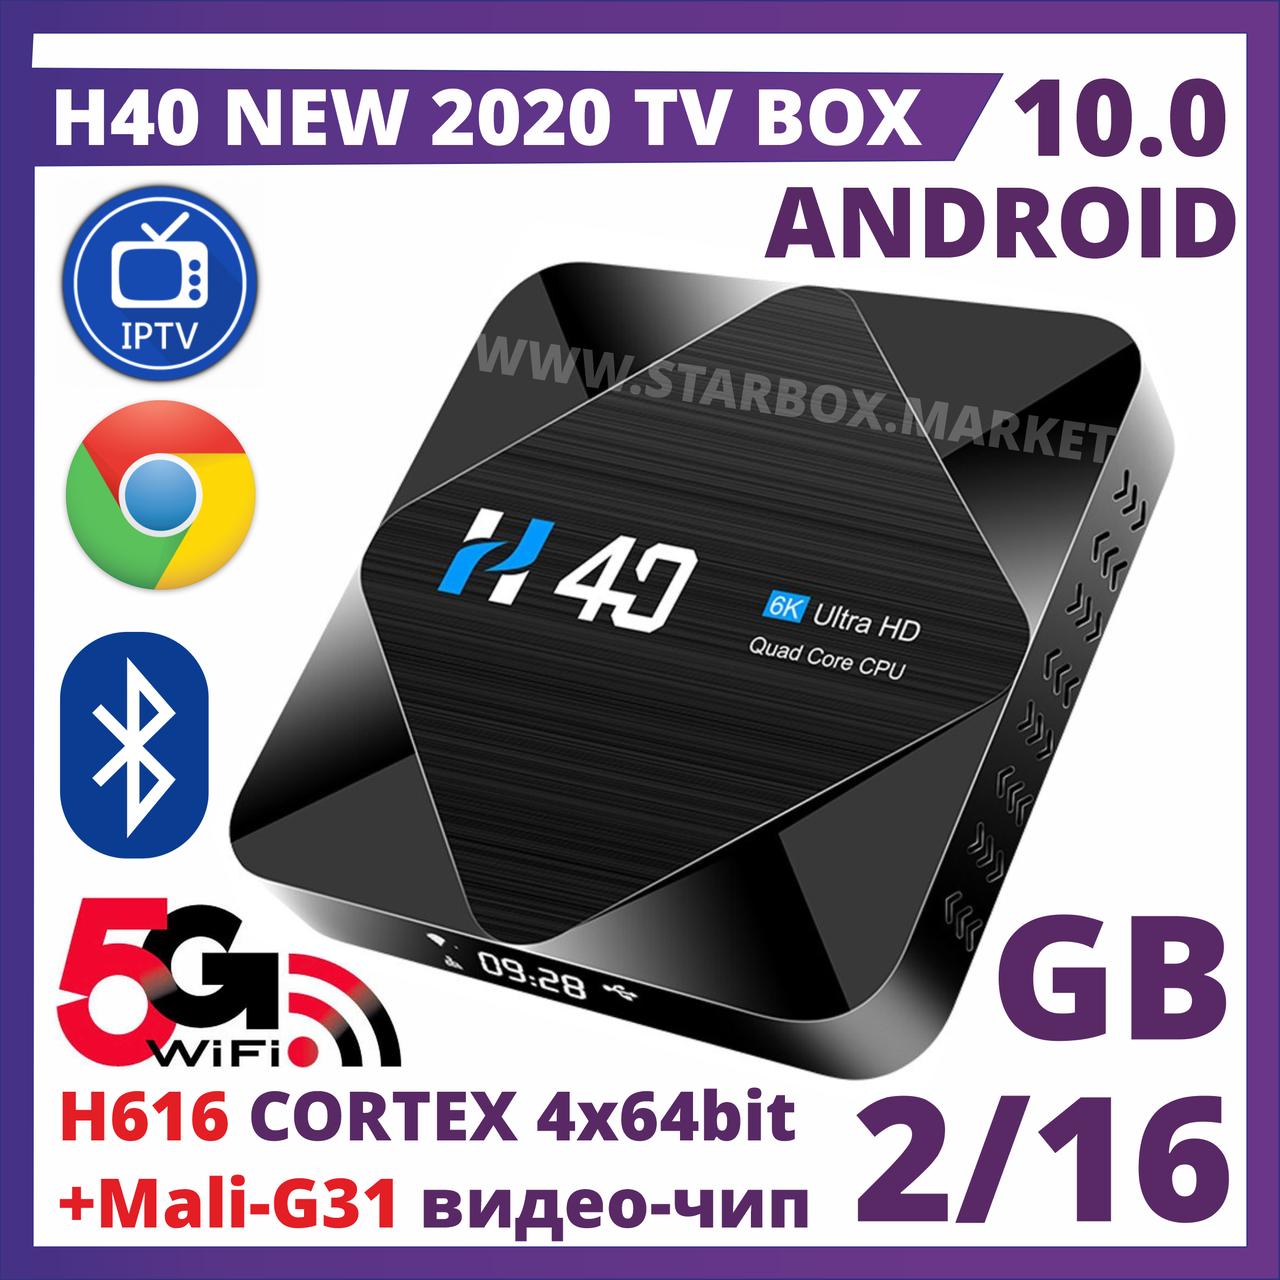 H40 Smart TV Box 2 16gb Android 10.0 Allwinner UHD 6K Медиаплеер Cortex A53 H616,ТВ приставка андроид smartbox